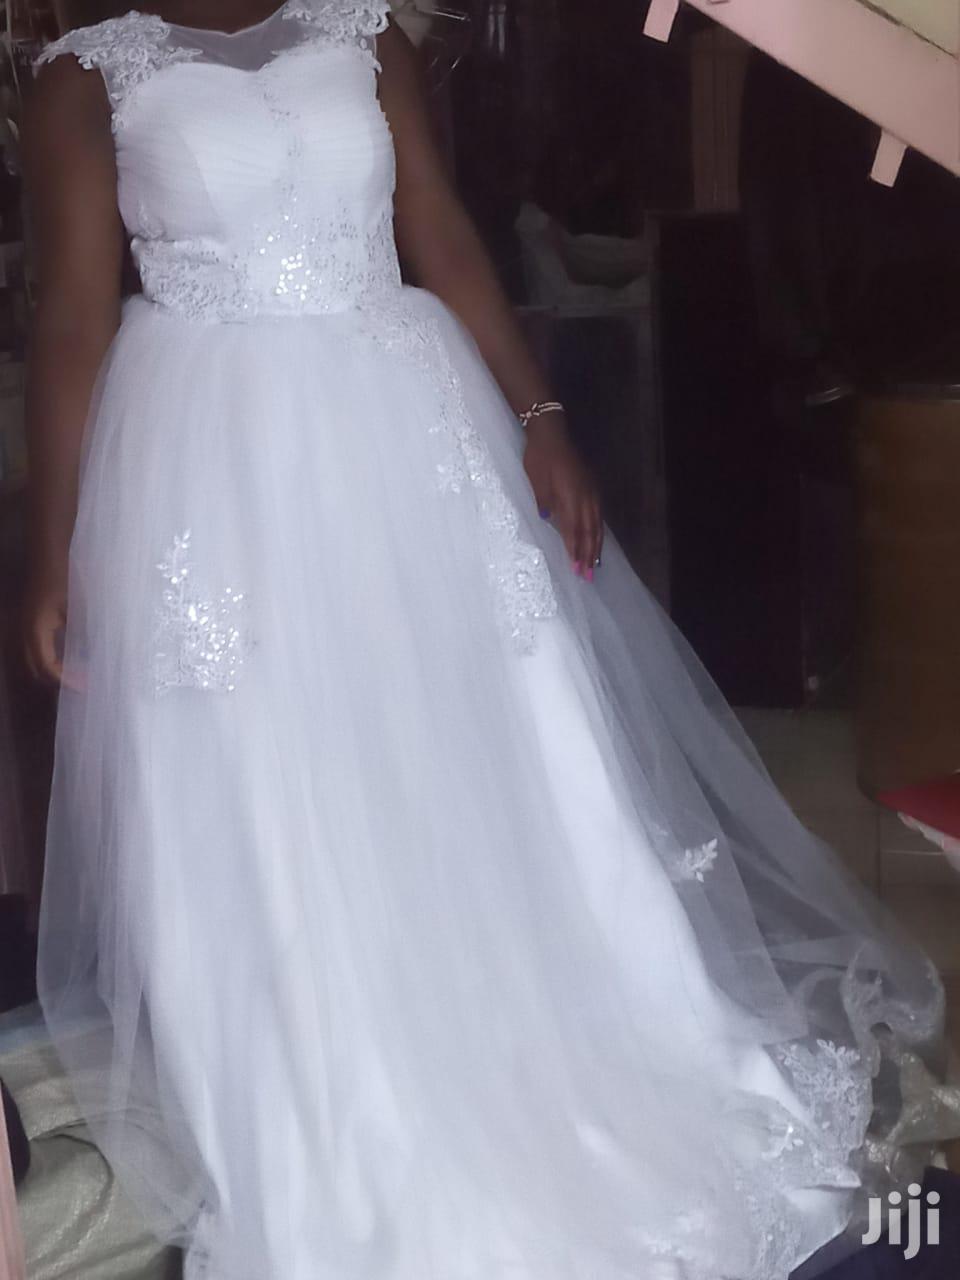 Gown for Hire at Mwiki , Maji Mazuri | Wedding Wear & Accessories for sale in Mwiki, Nairobi, Kenya